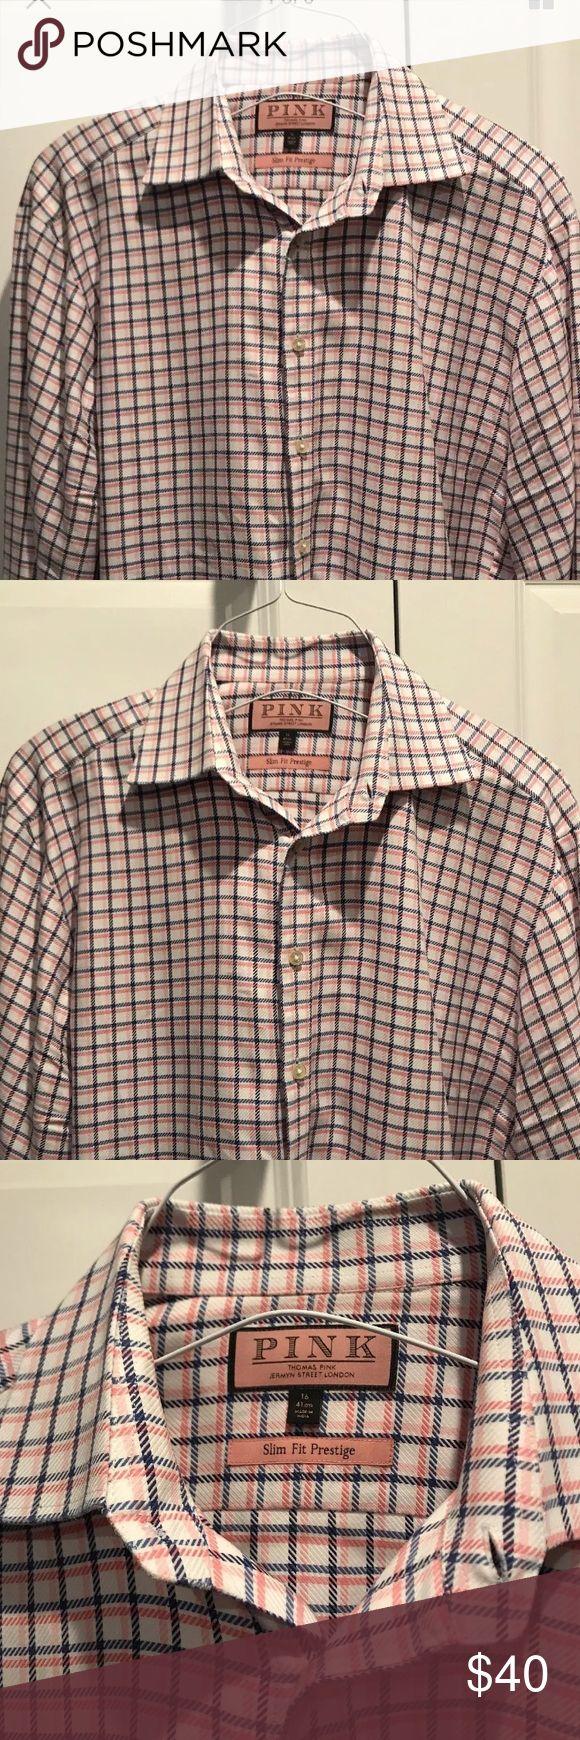 Thomas pink prestige line size 16 shirt Thomas pink prestige line size 16 shirt. White, pink, and navy. Thomas Pink Shirts Dress Shirts